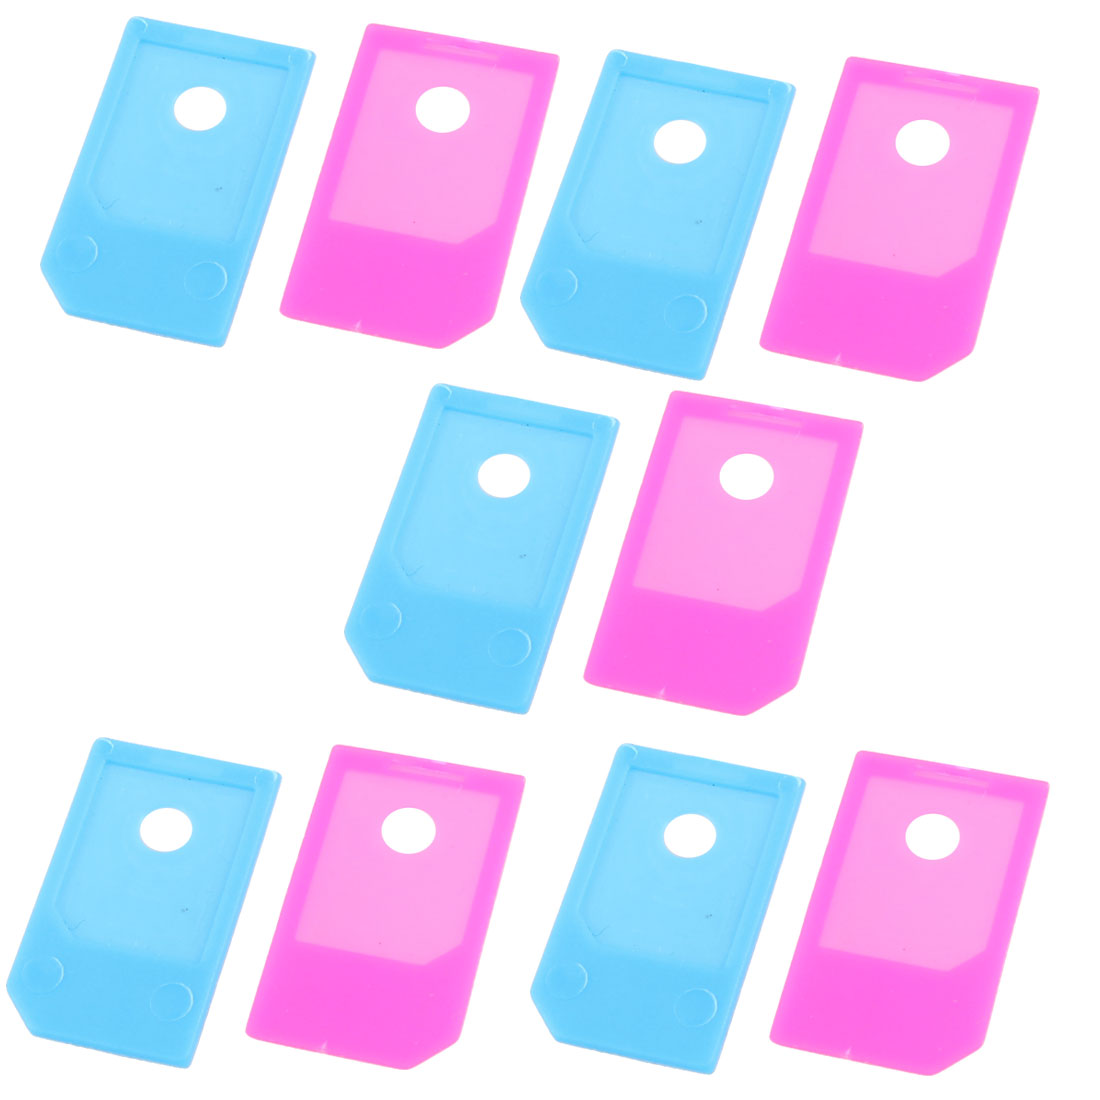 10 Pcs Light Blue Fuchsia Micro SIM to SIM Adapter for Phone